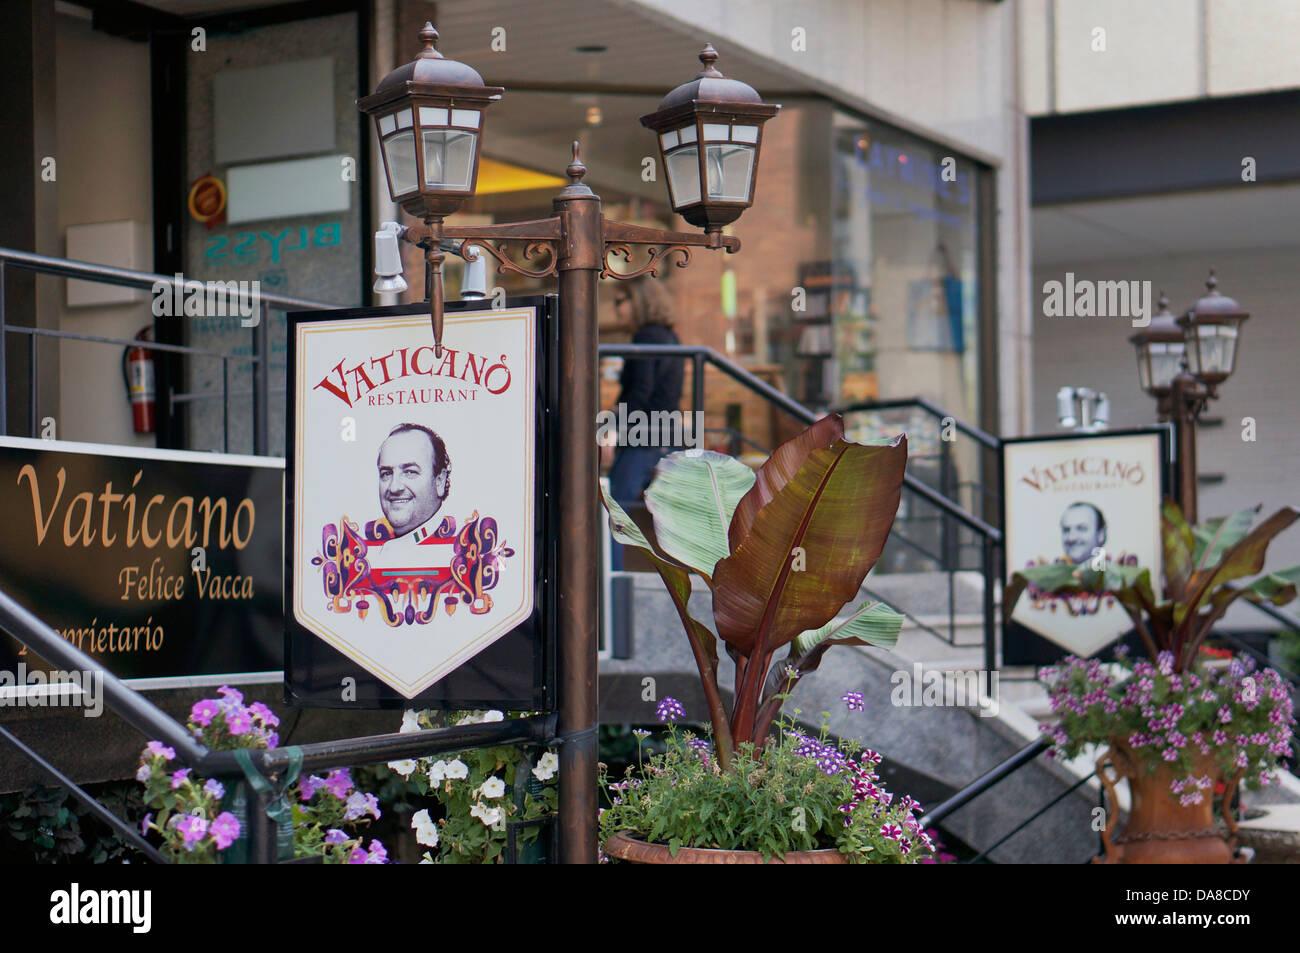 Yorkville, Toronto, Vaticano Restaurant - Stock Image